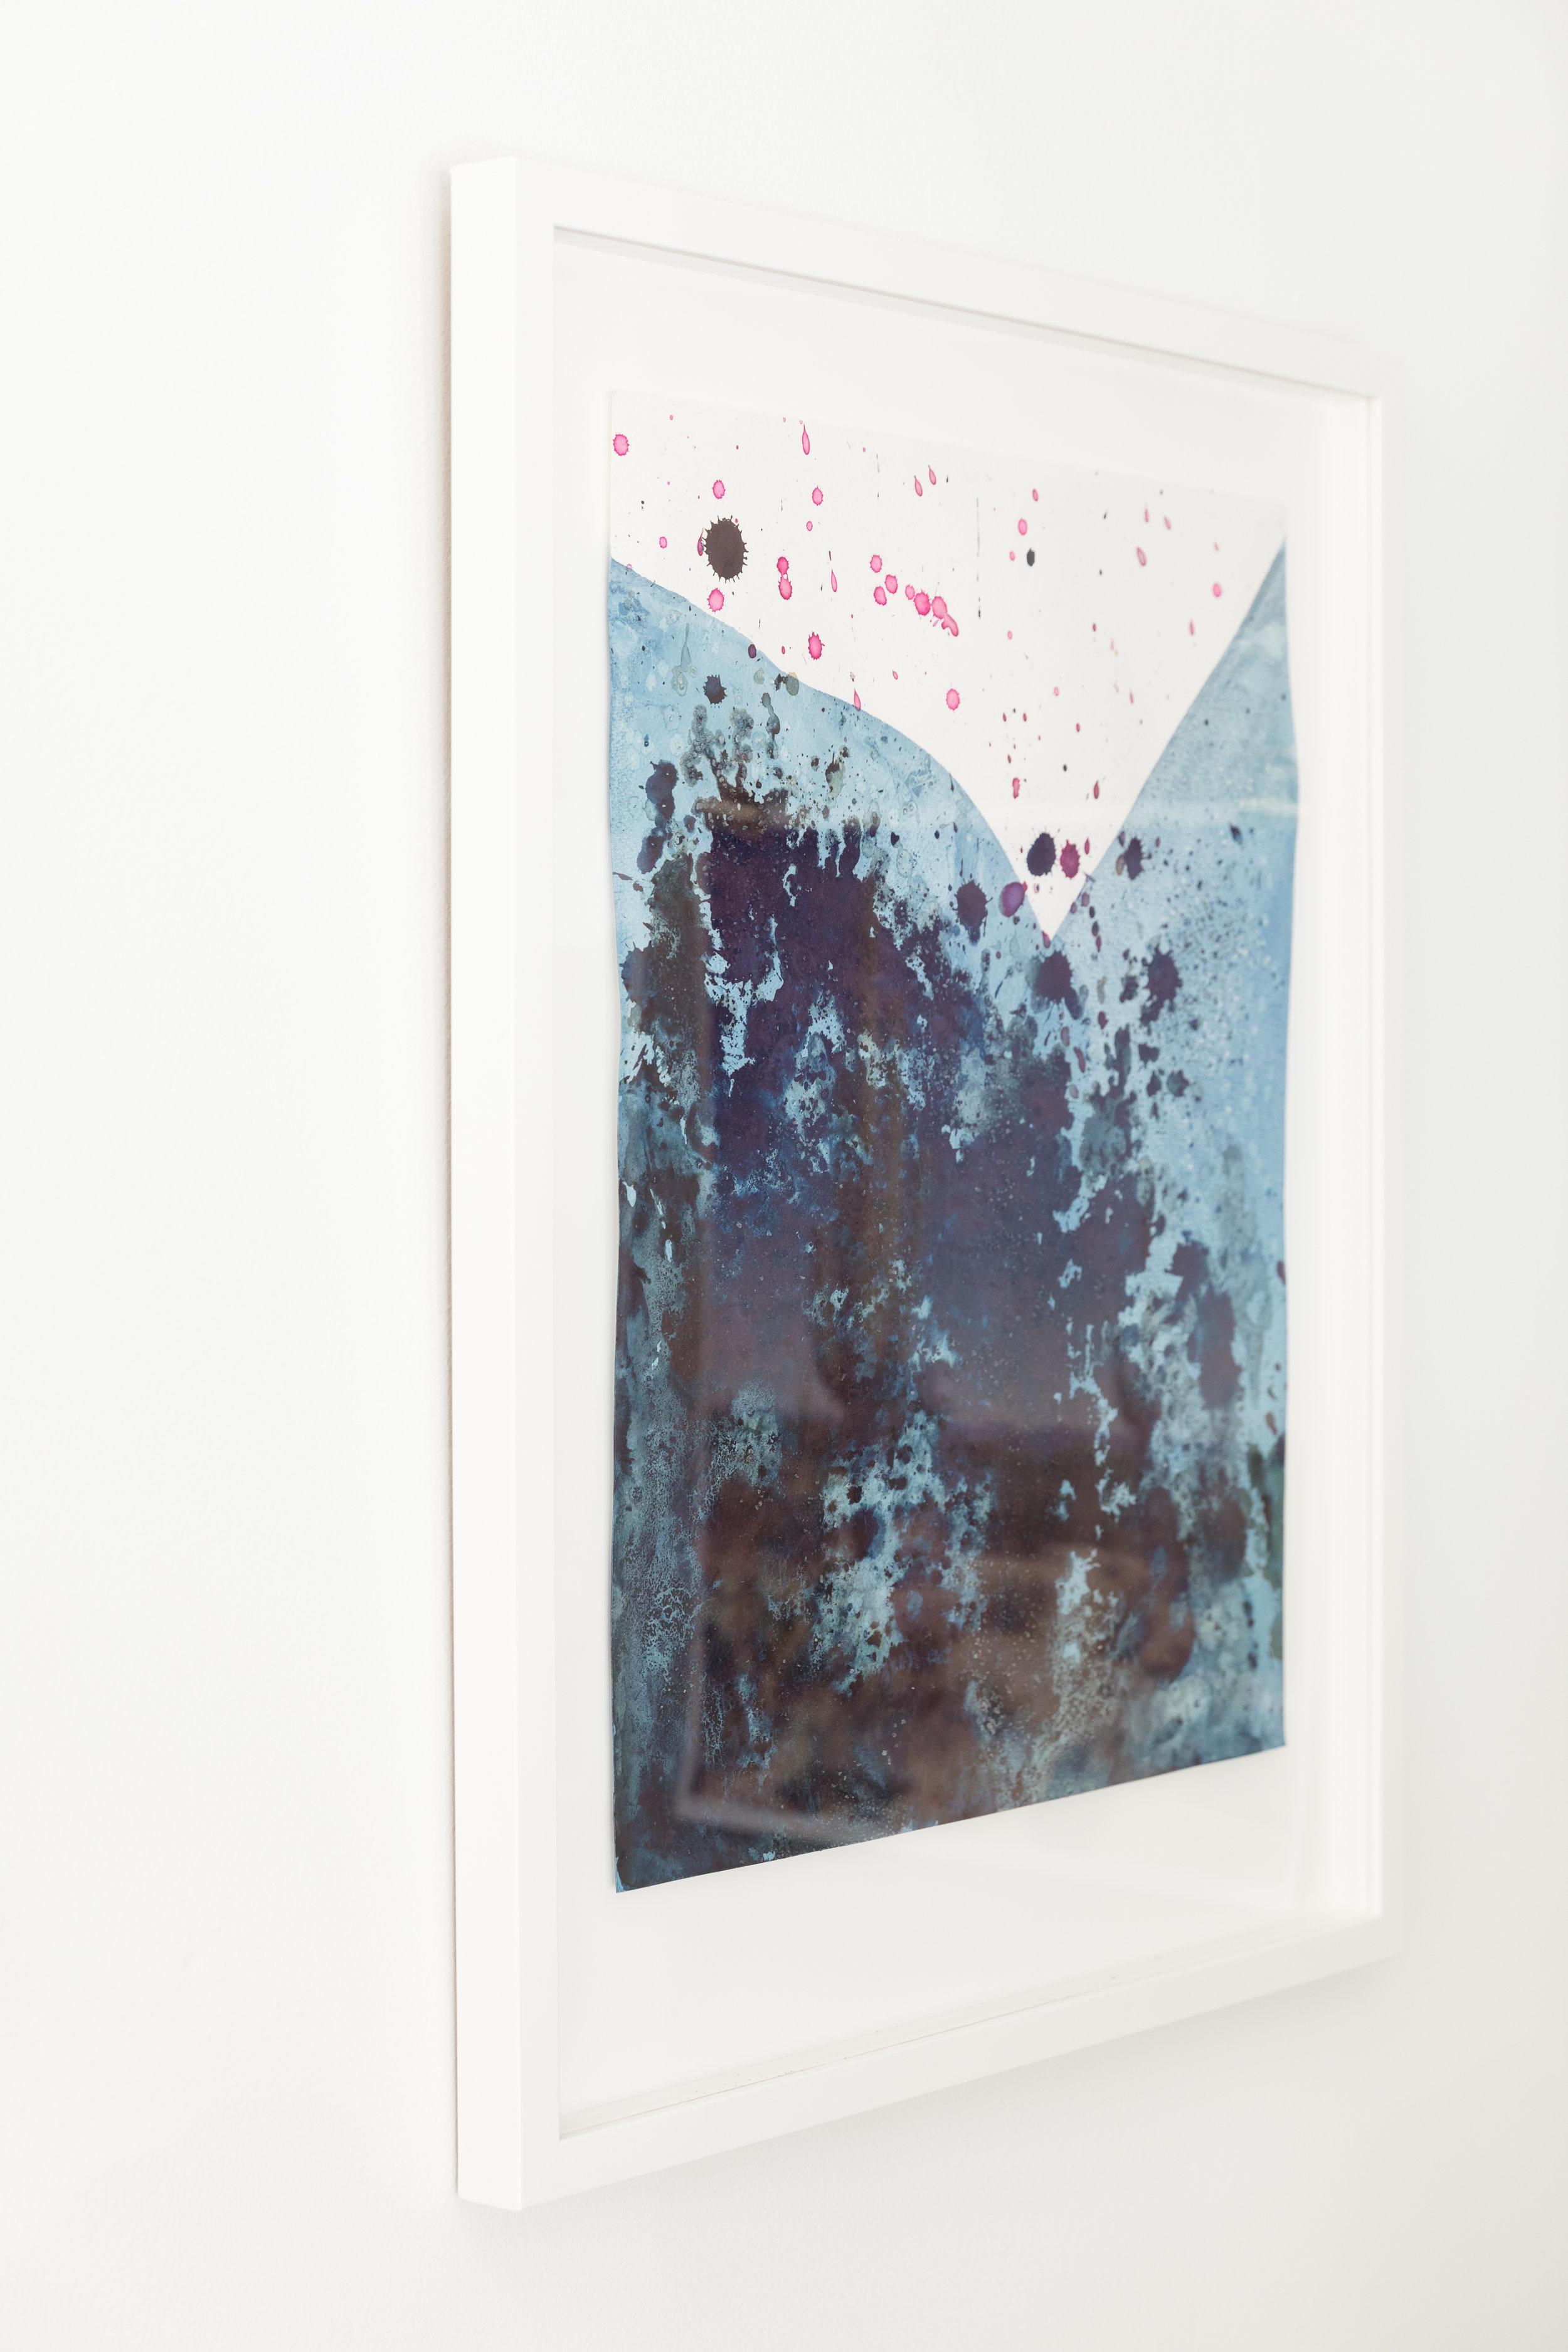 Texas Desert II  , 2017, cotton paper, indigo, poke berries, 21.5 x 25.5 inches framed